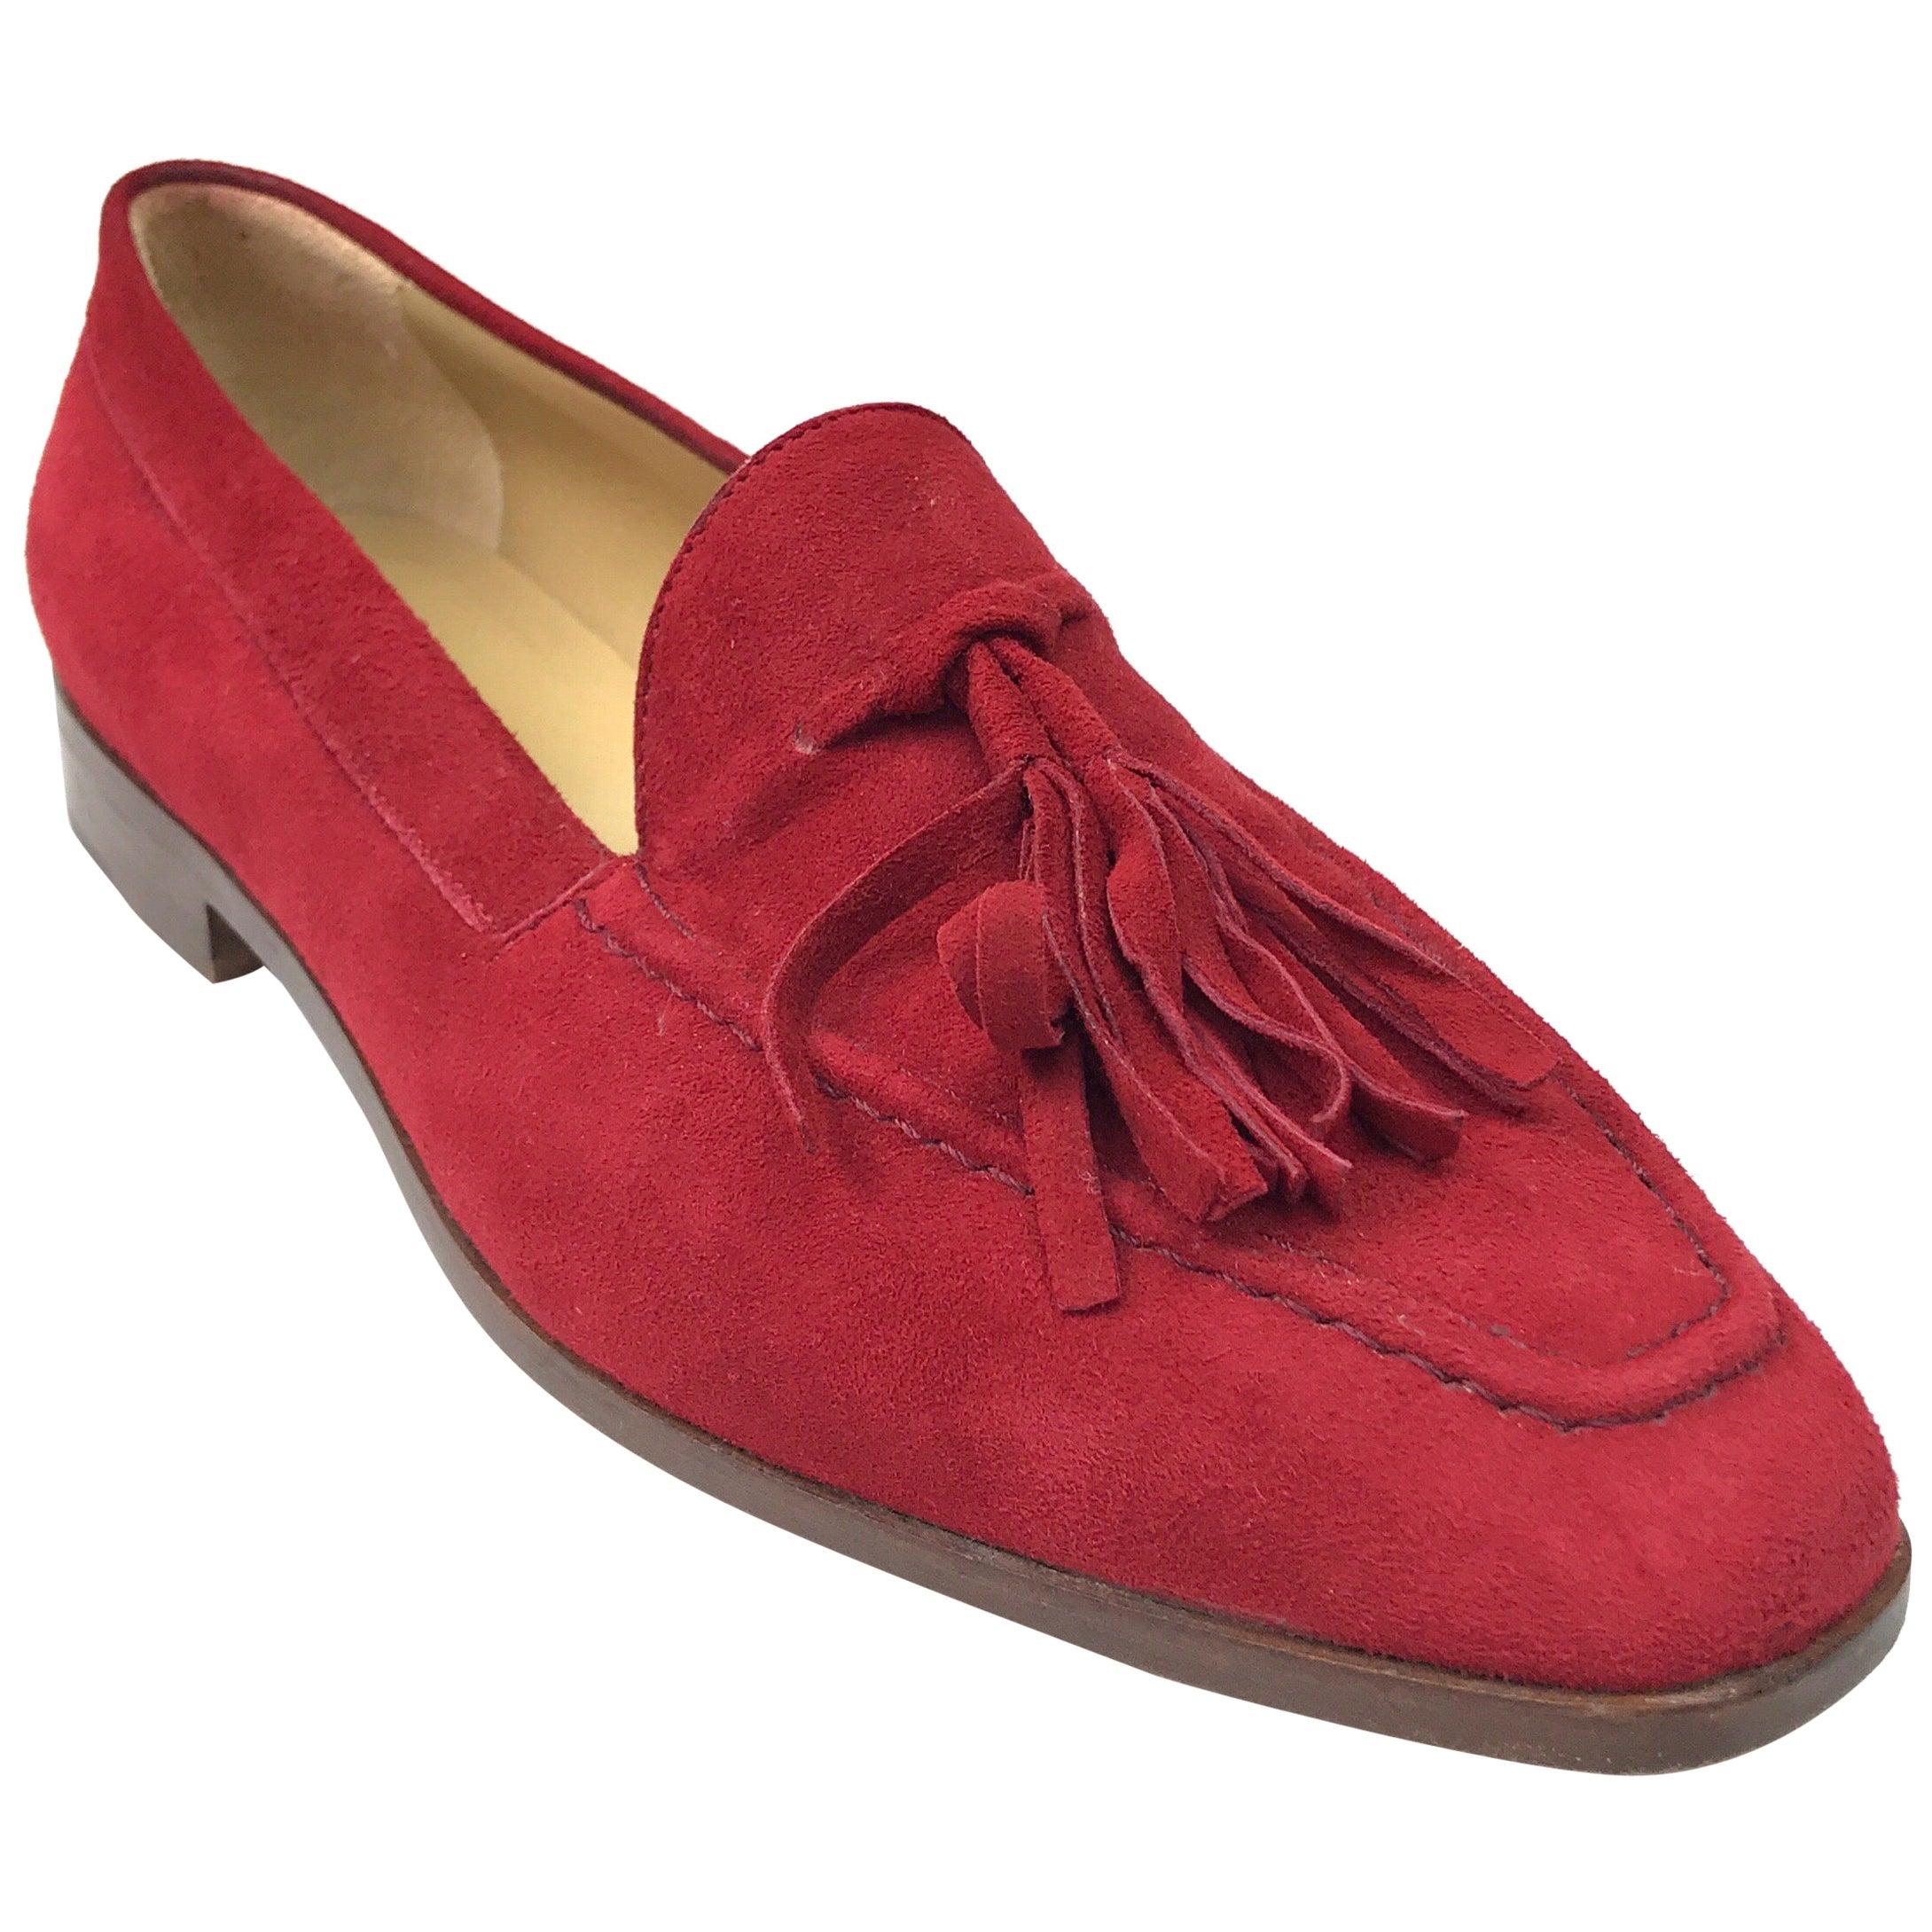 Gucci Red Suede Tassel Loafer - 6